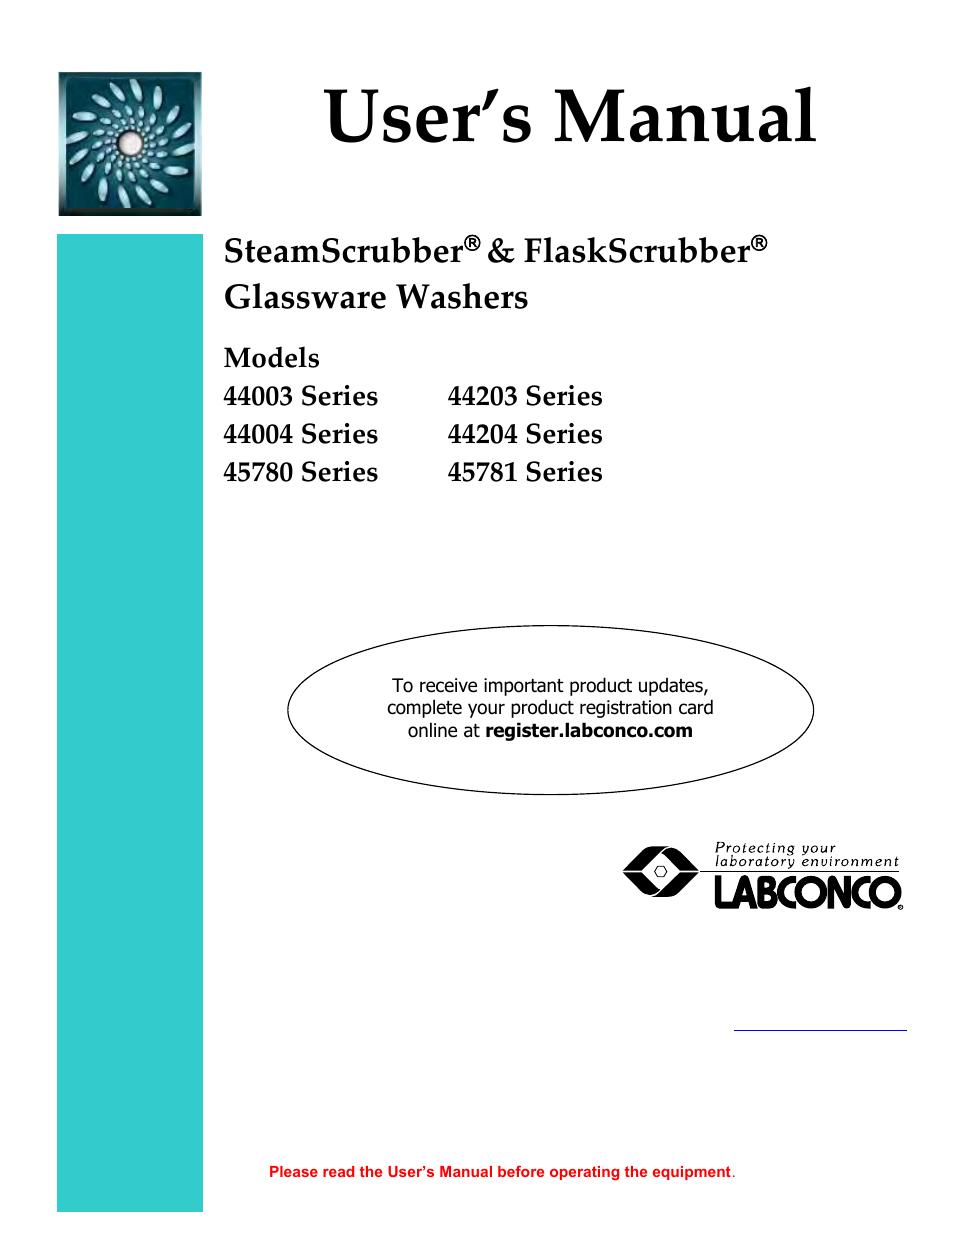 labconco-steamscrubbe-flaskscrubbe-glassware-washers-45781-series-page1.png